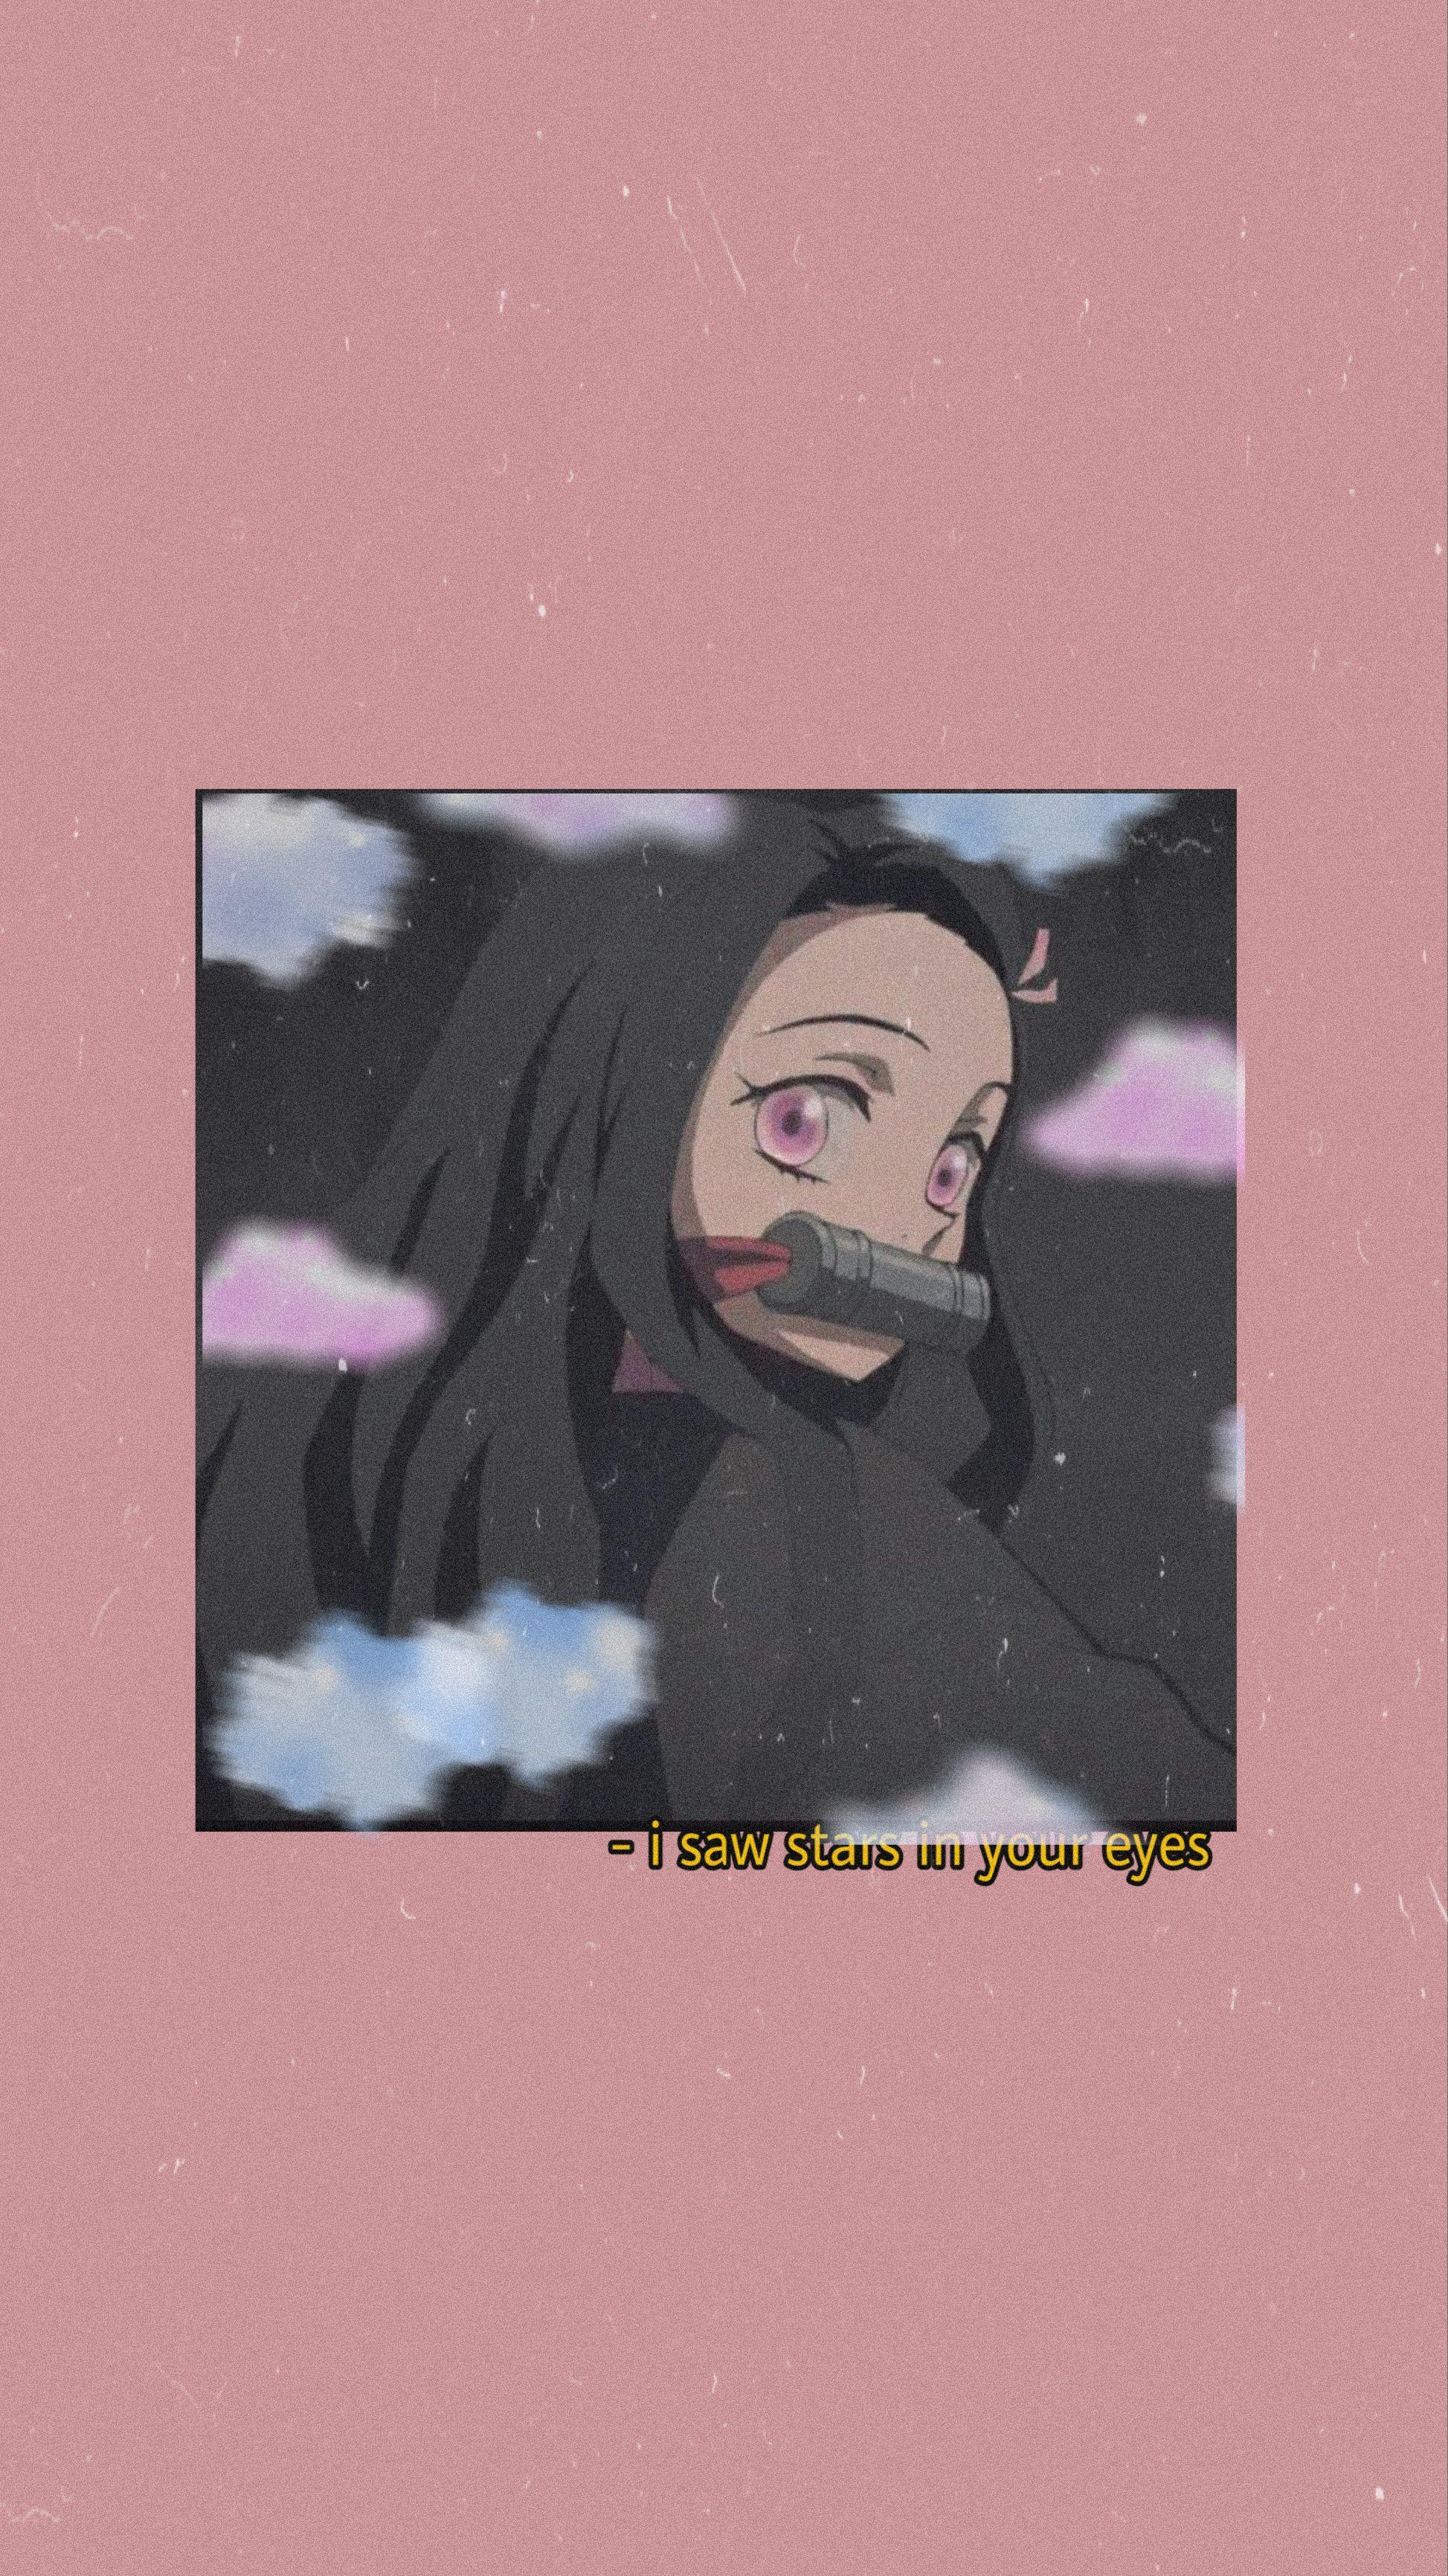 Nezuko demon slayer en 2020 Anime estético, Muchacha de